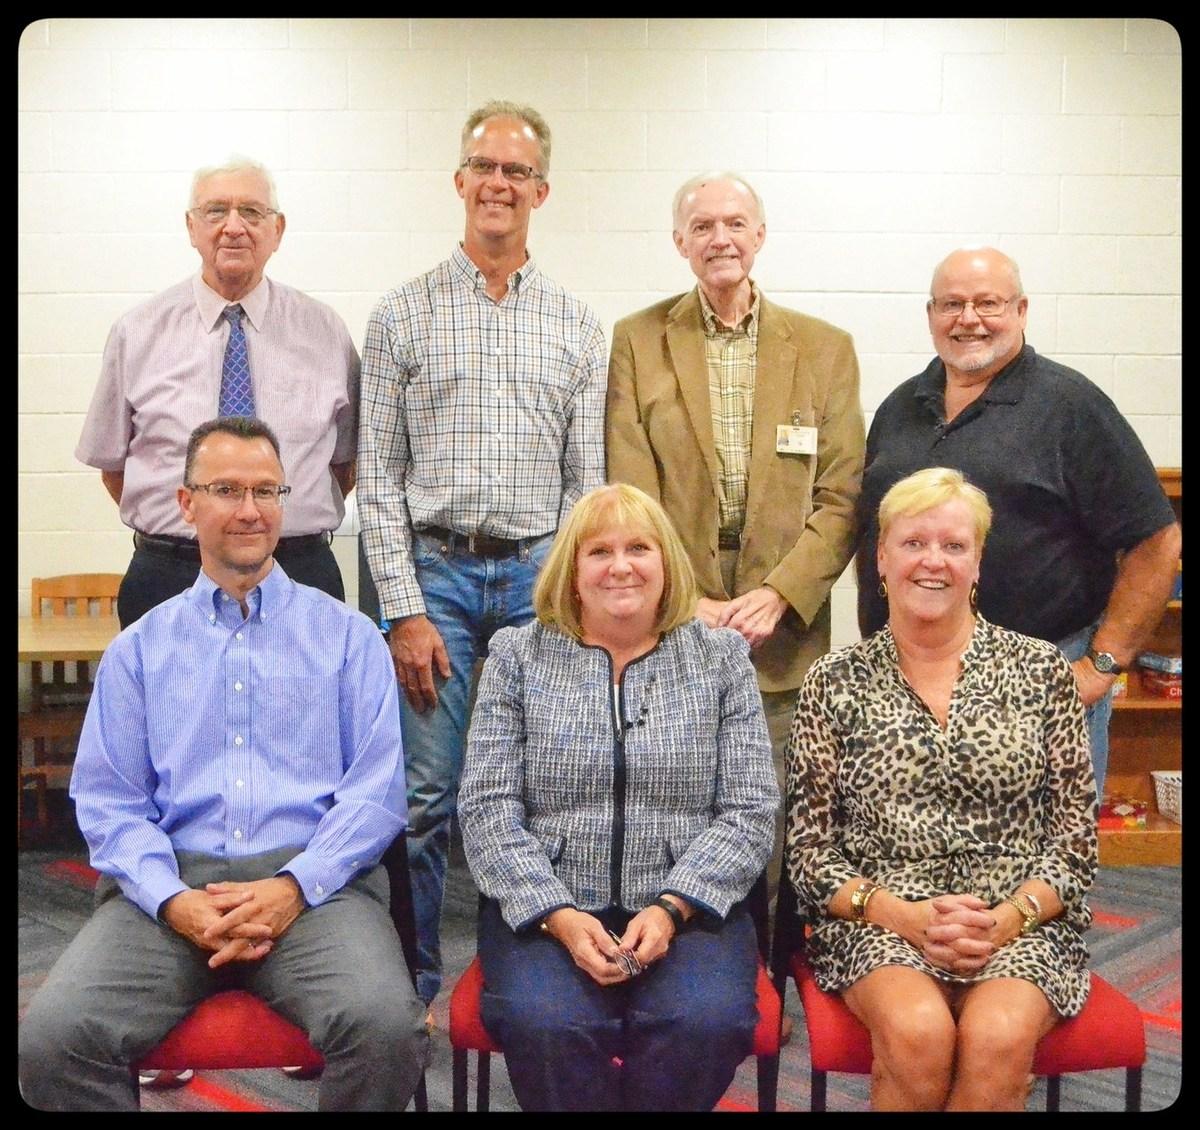 Board of Education Members